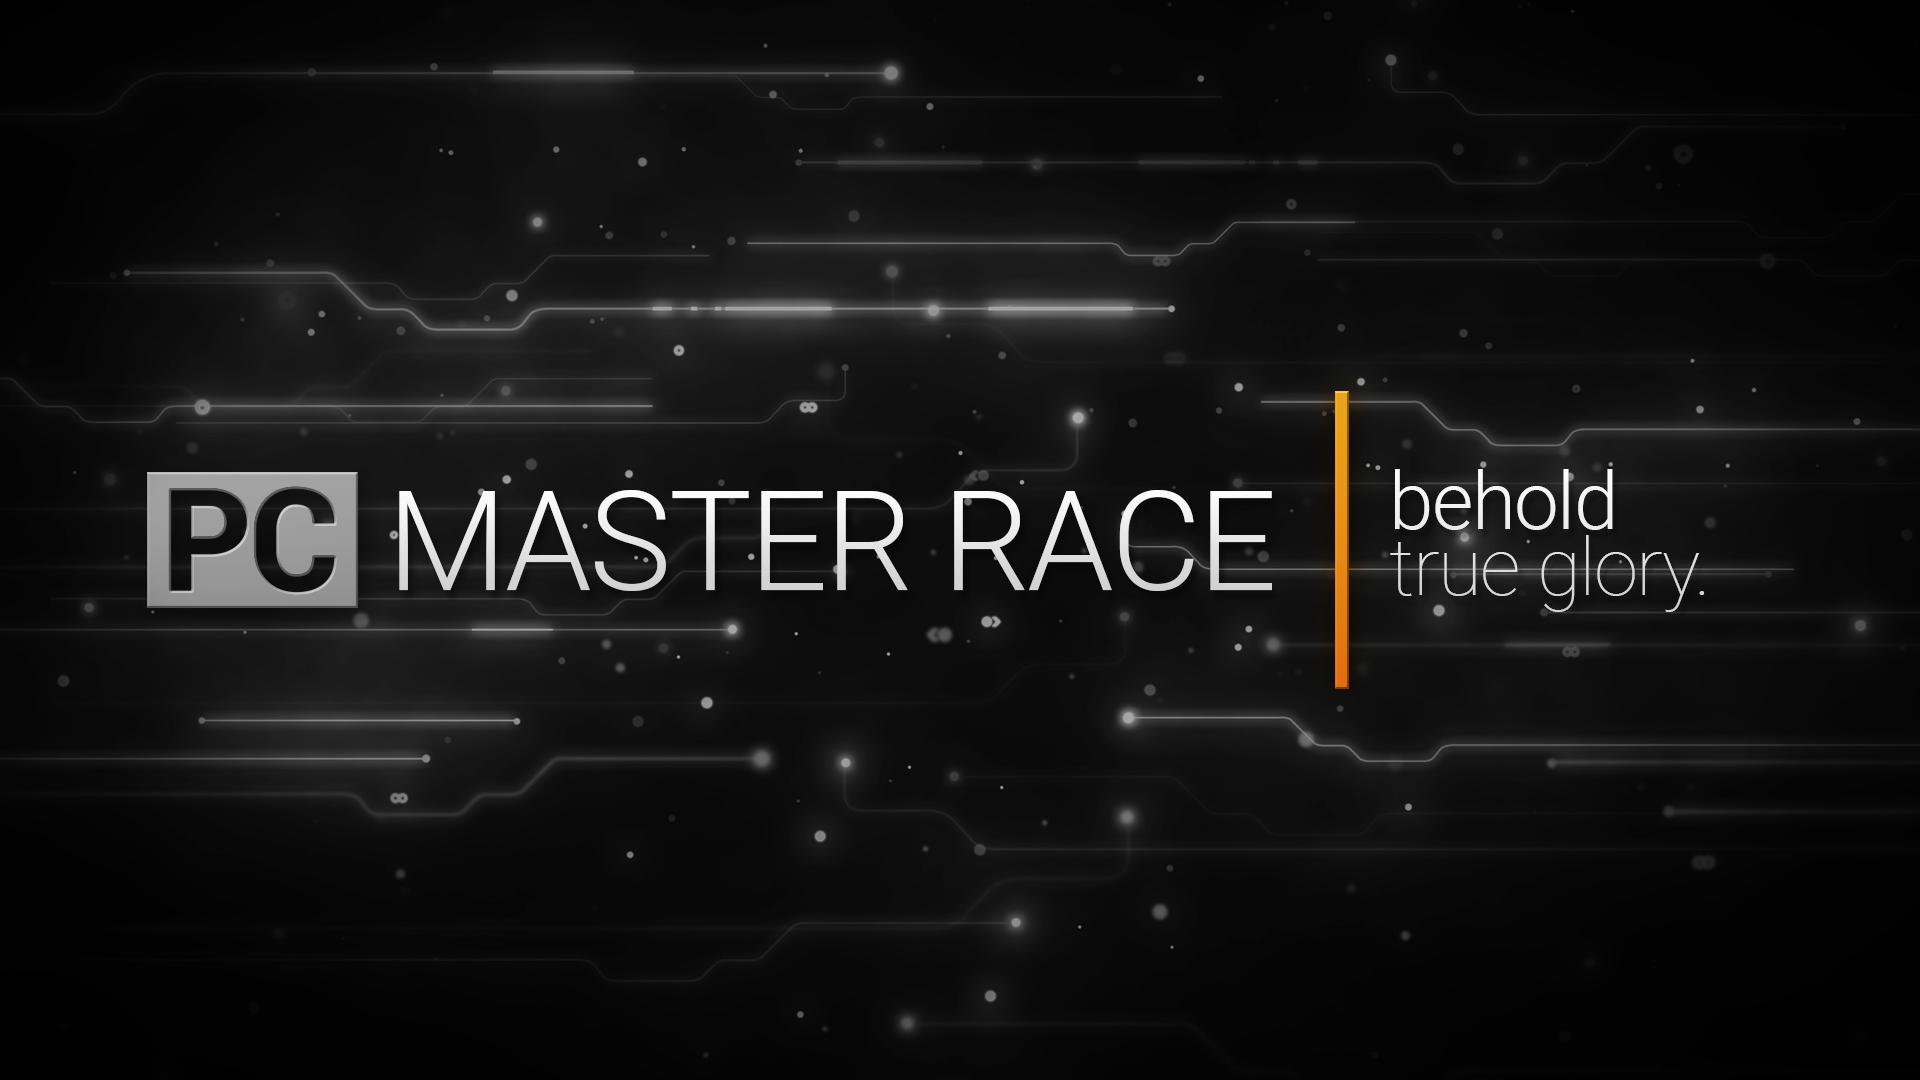 pc master race wallpaper - photo #6